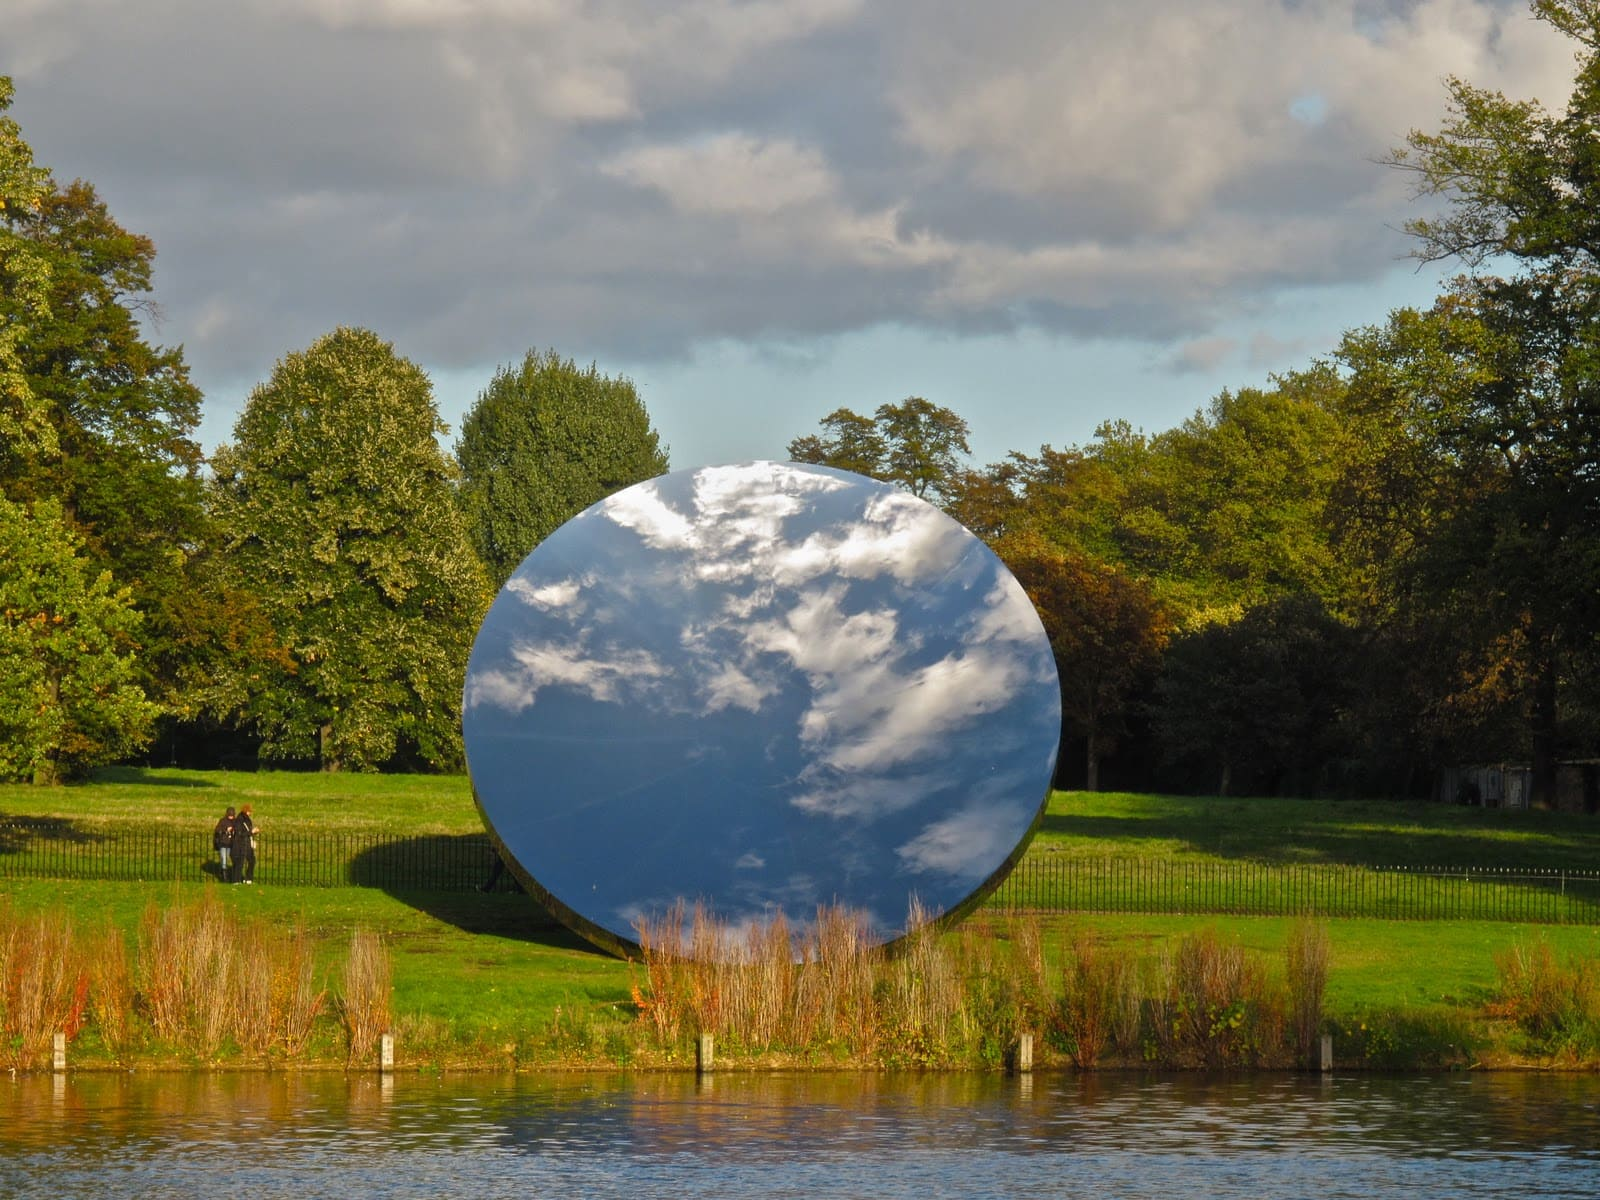 Anish Kapoor's 'Sky Mirror', Kensington Gardens 2006